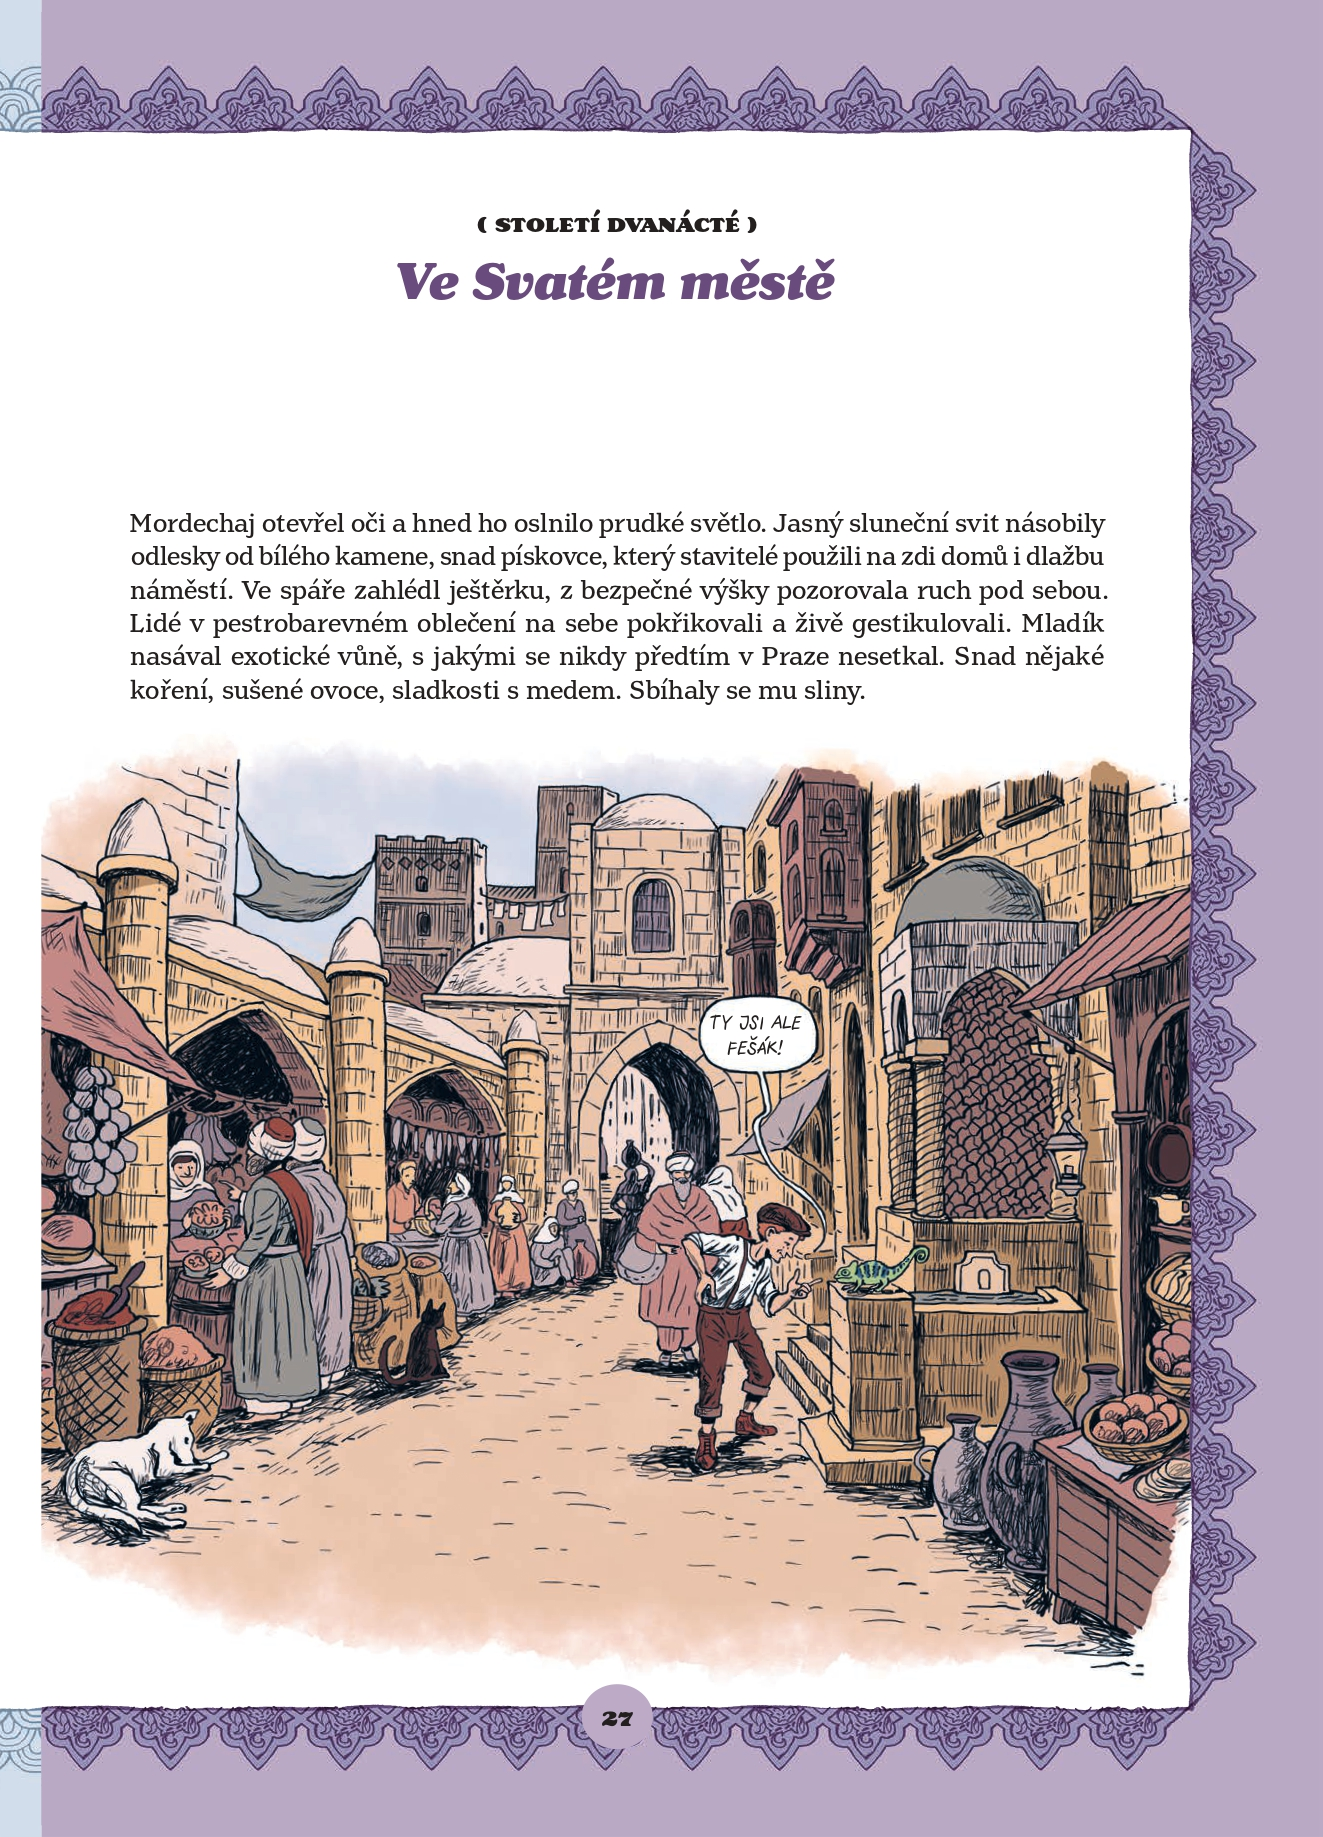 Cha_cha_cha_zasmal_se_Mordechaj-28_page-0001